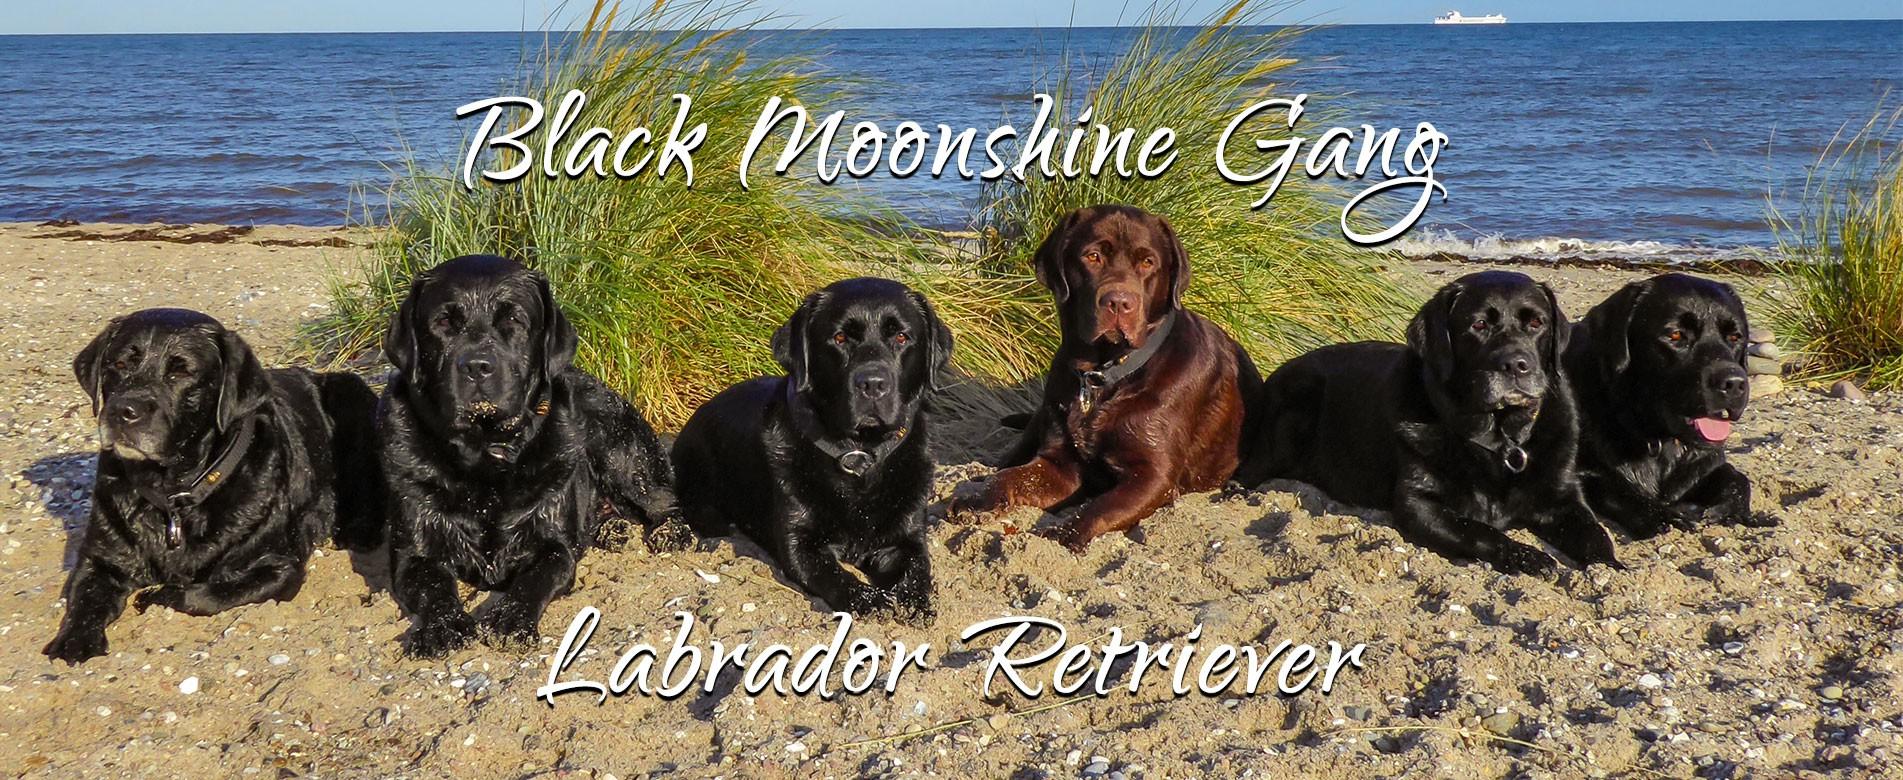 Black Moonshine Gang